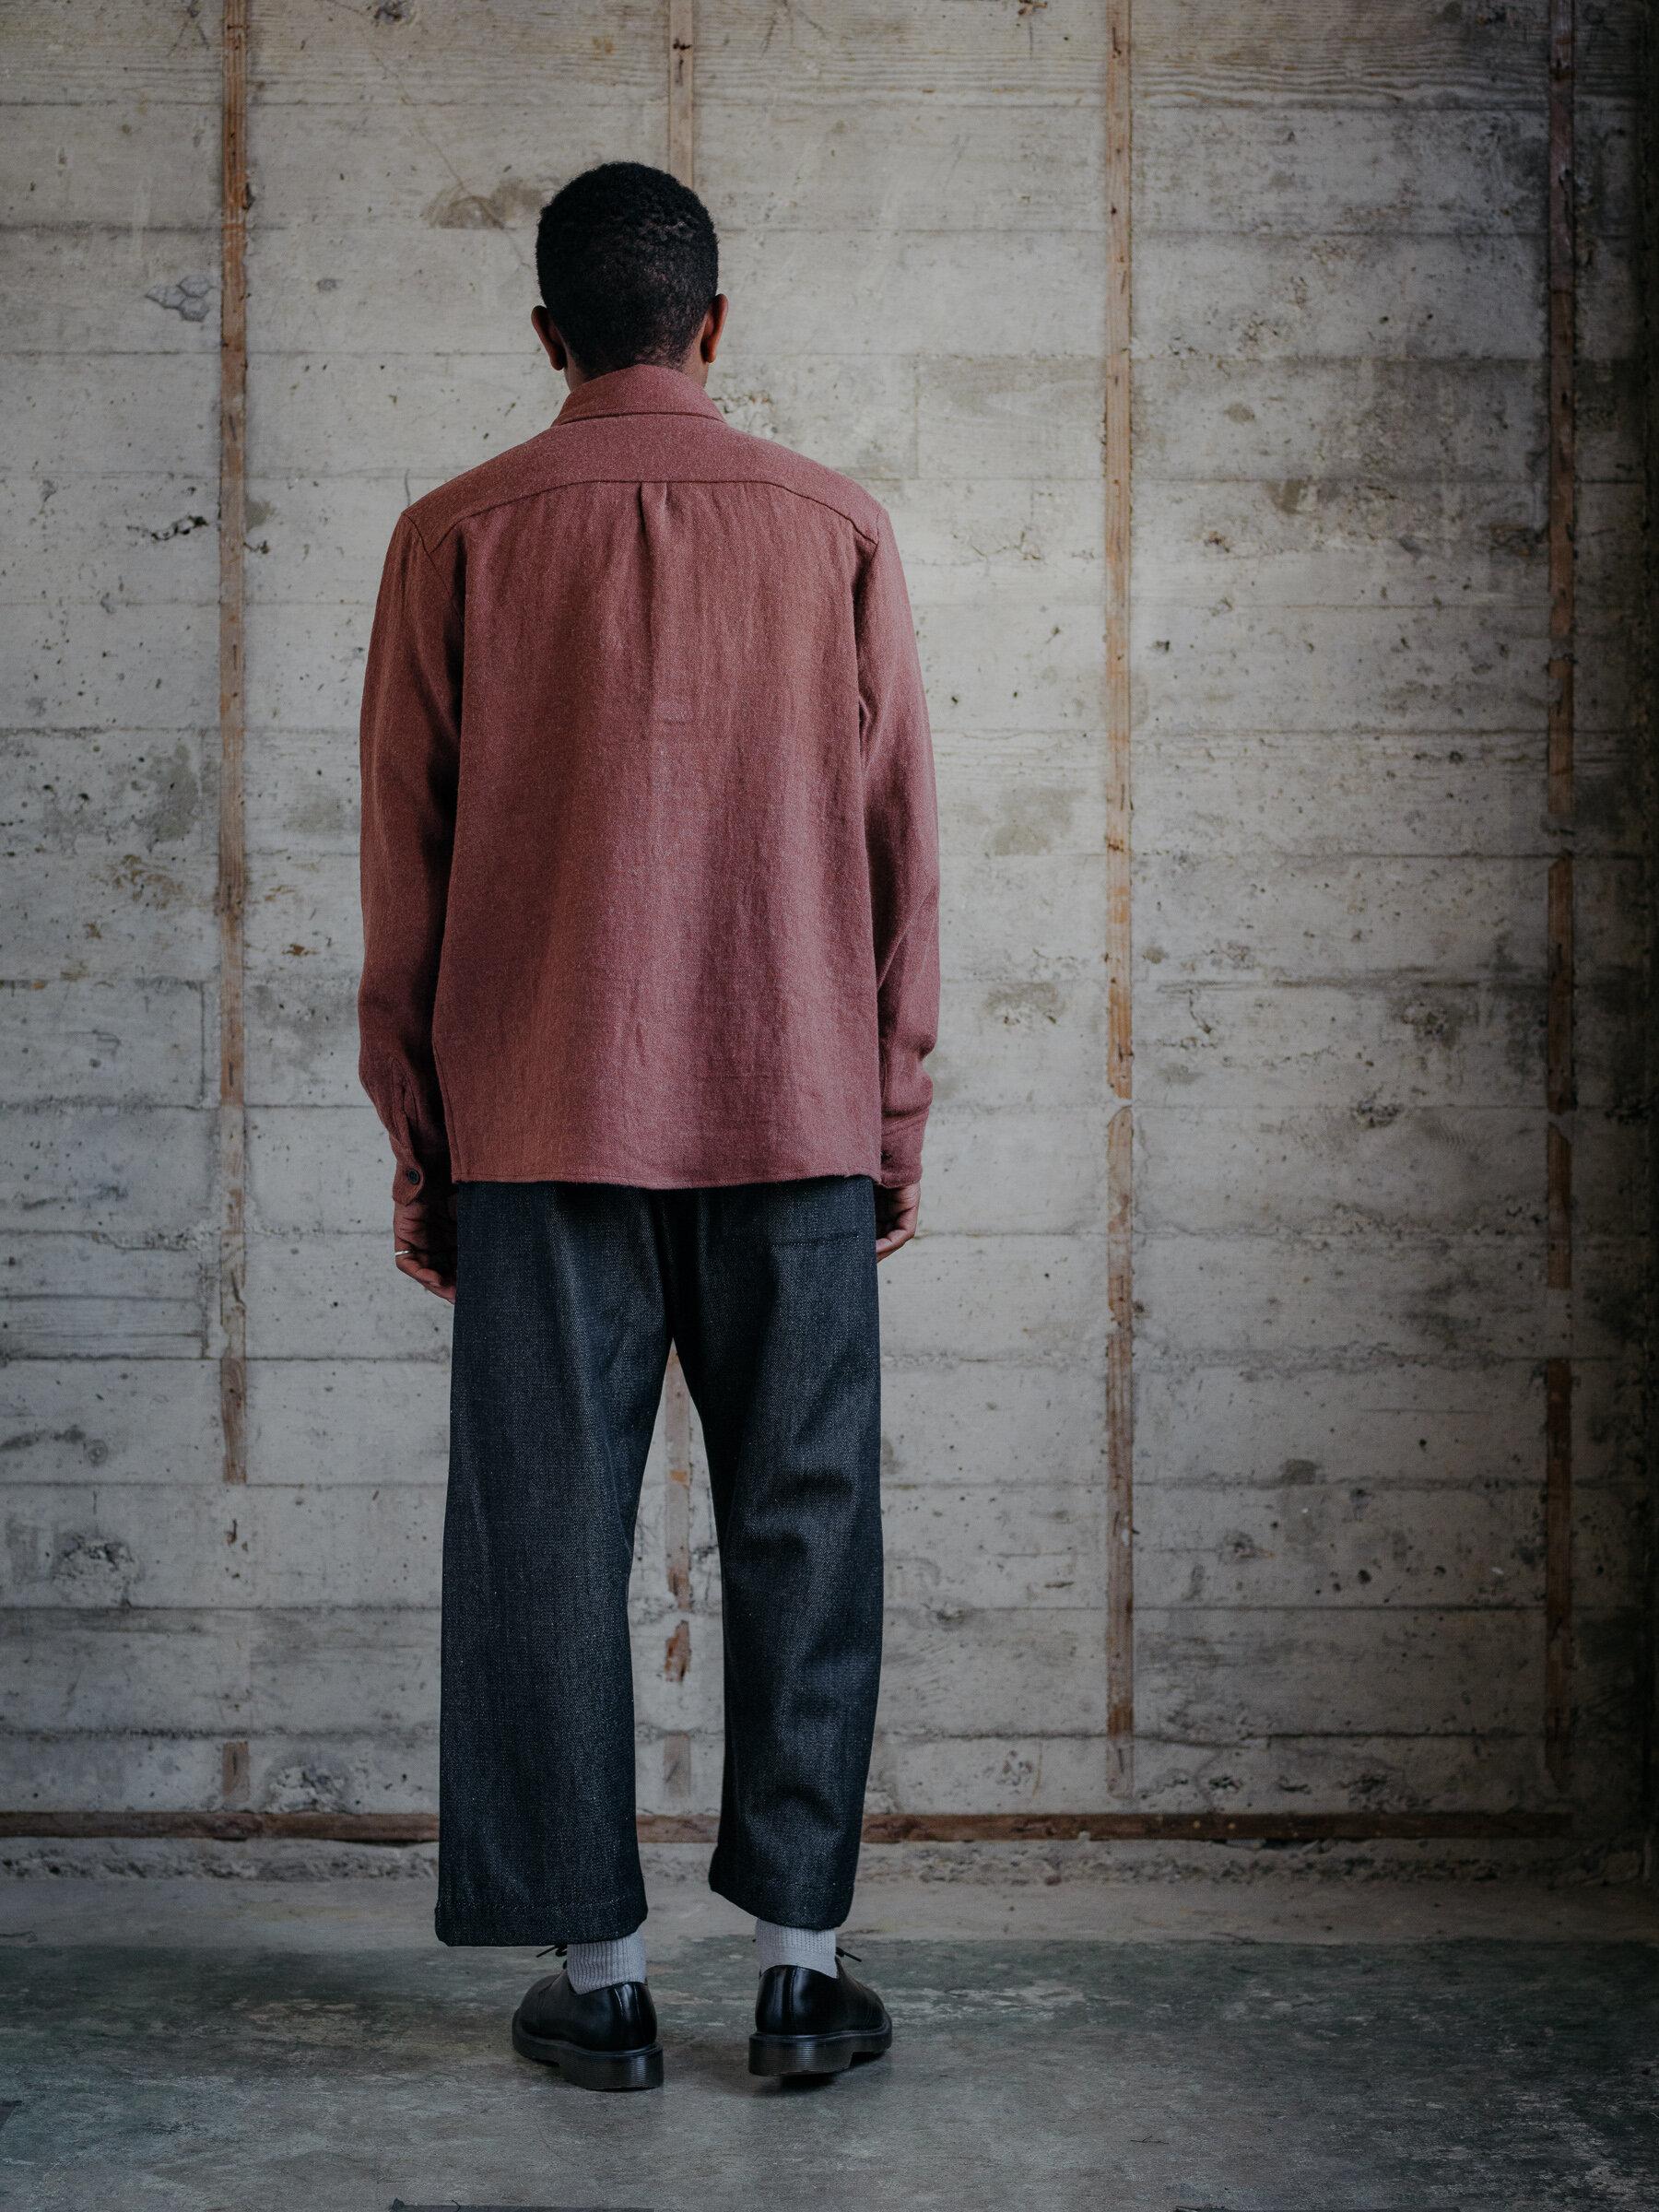 evan-kinori-two-pocket-shirt-linen-wool-twill-woven-in-japan-4